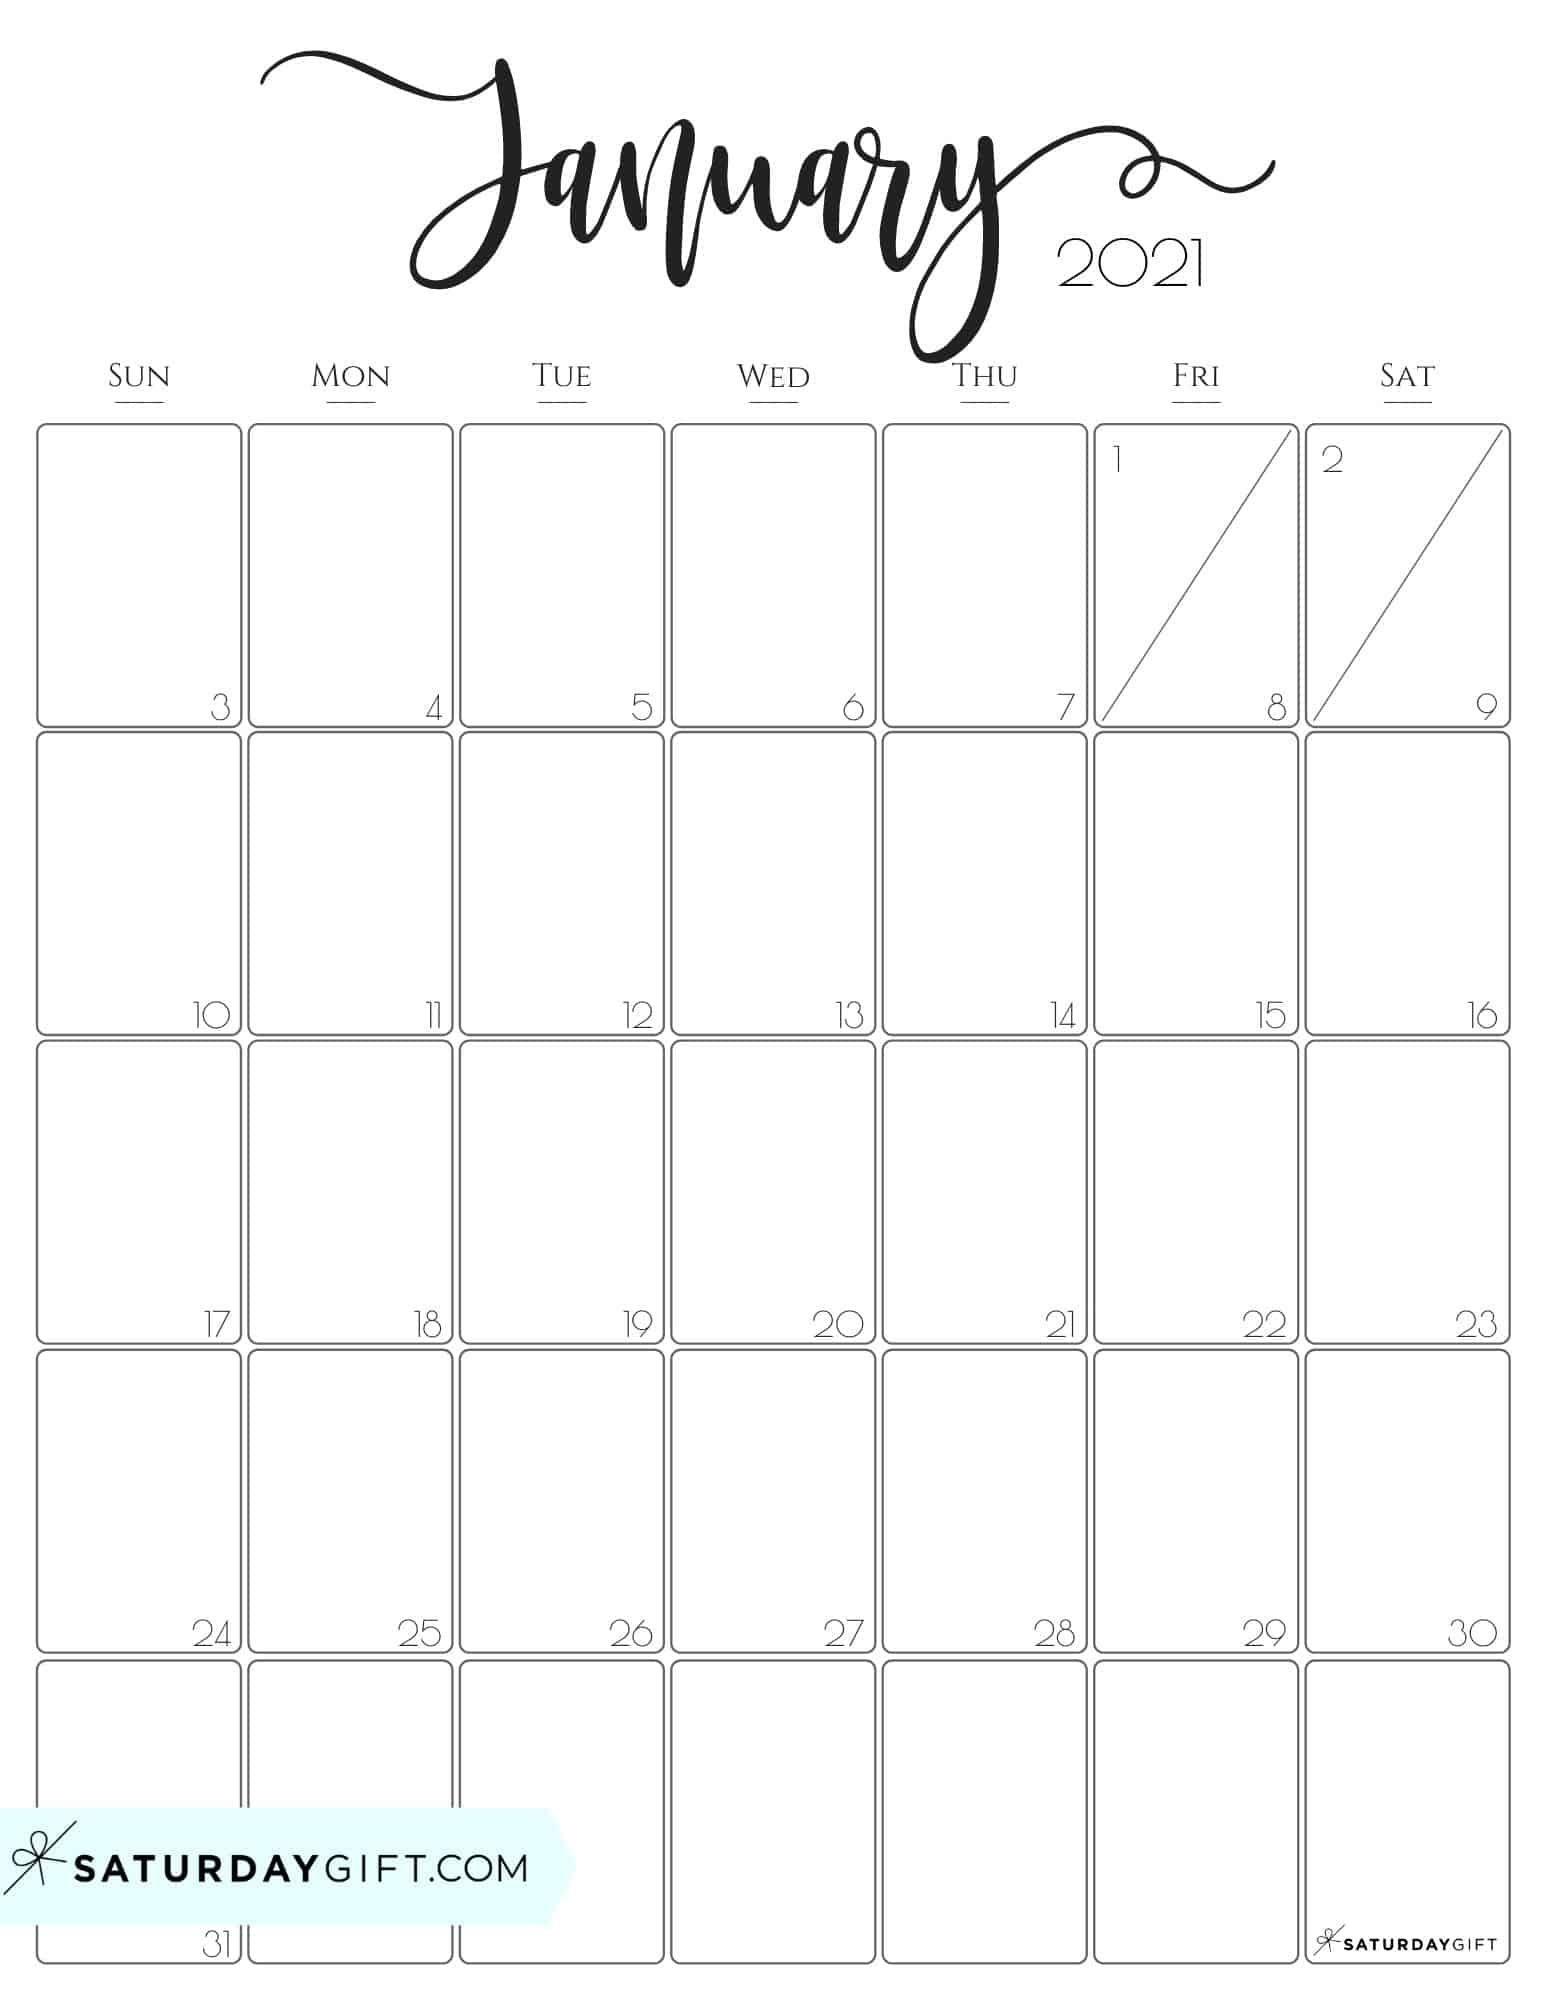 January 2021 Calendar Printable Monday Start   Free Printable Calendar September 2021 Calendar Starting Monday